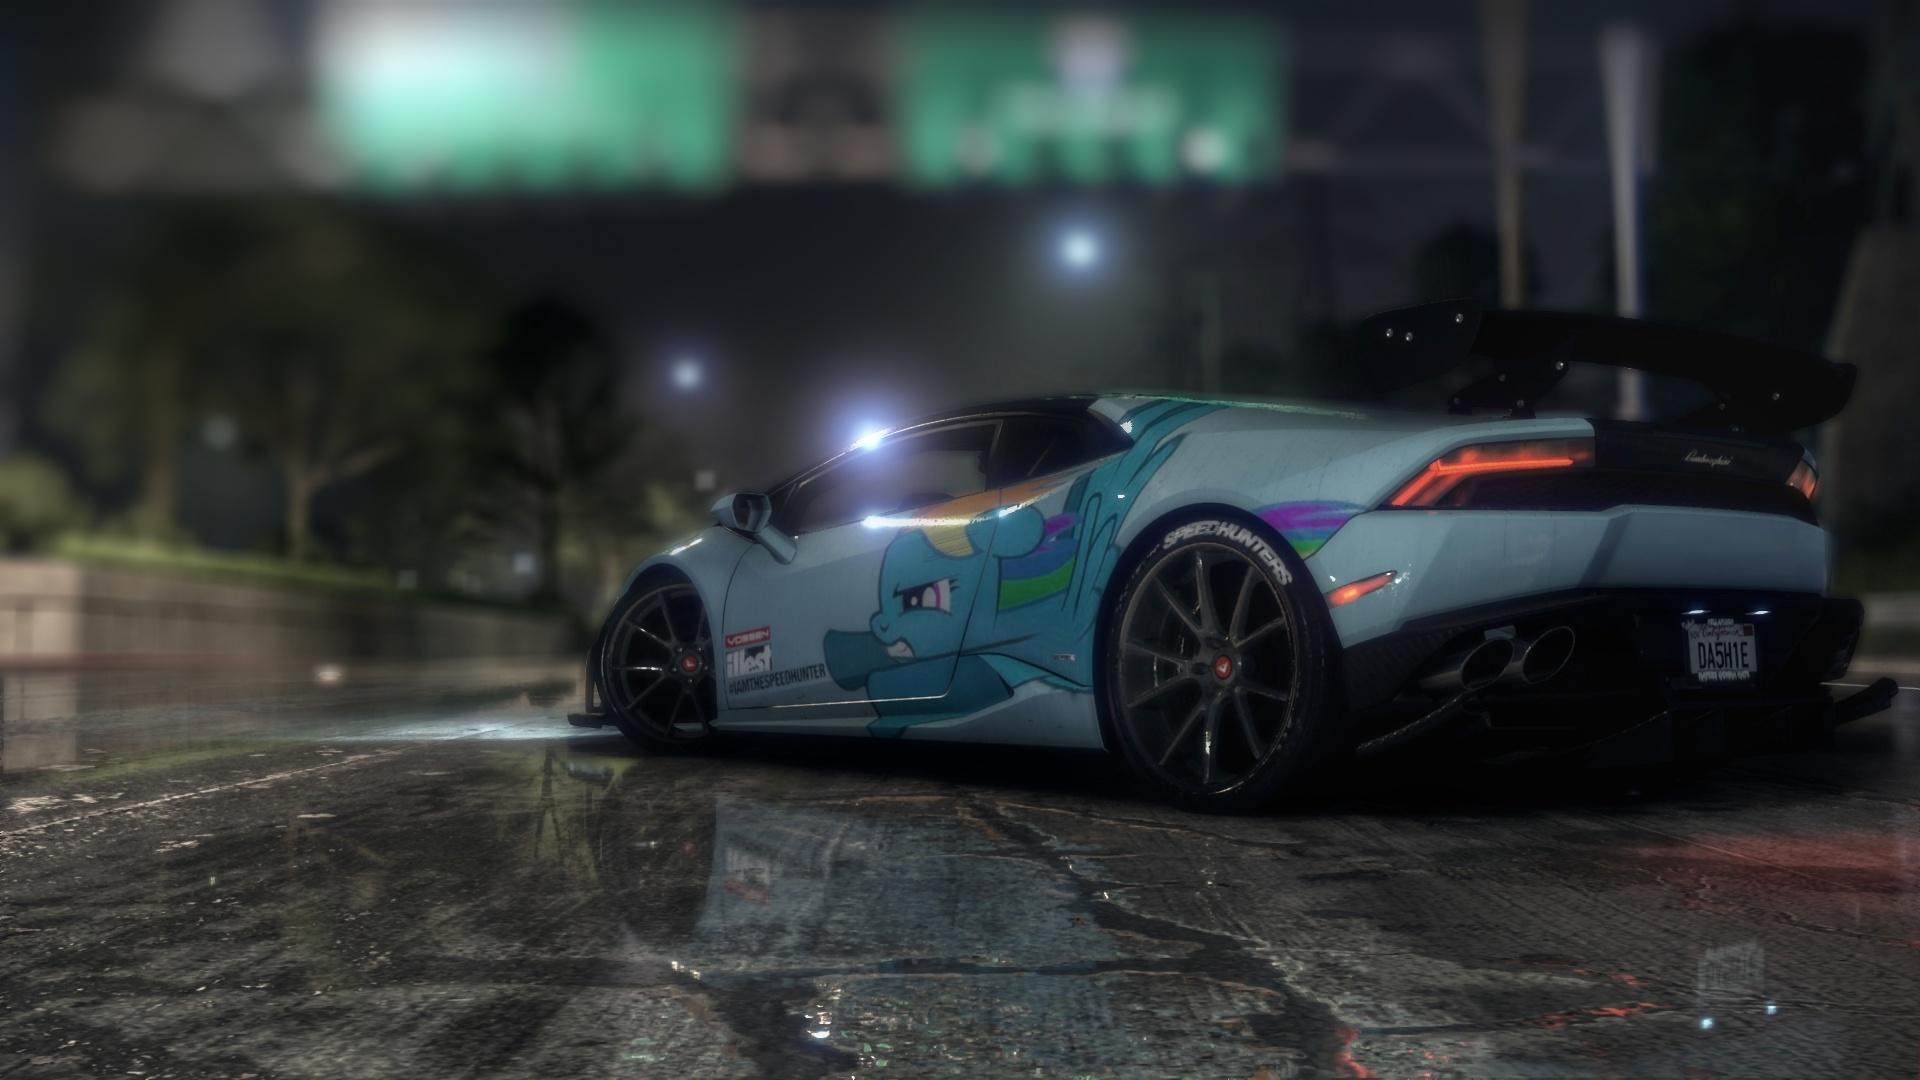 rainbow_dash_x_lamborghini_huracn__nfs2015__by_officialnebulax-dawvh4s Extraordinary Lamborghini Huracan Need for Speed Cars Trend